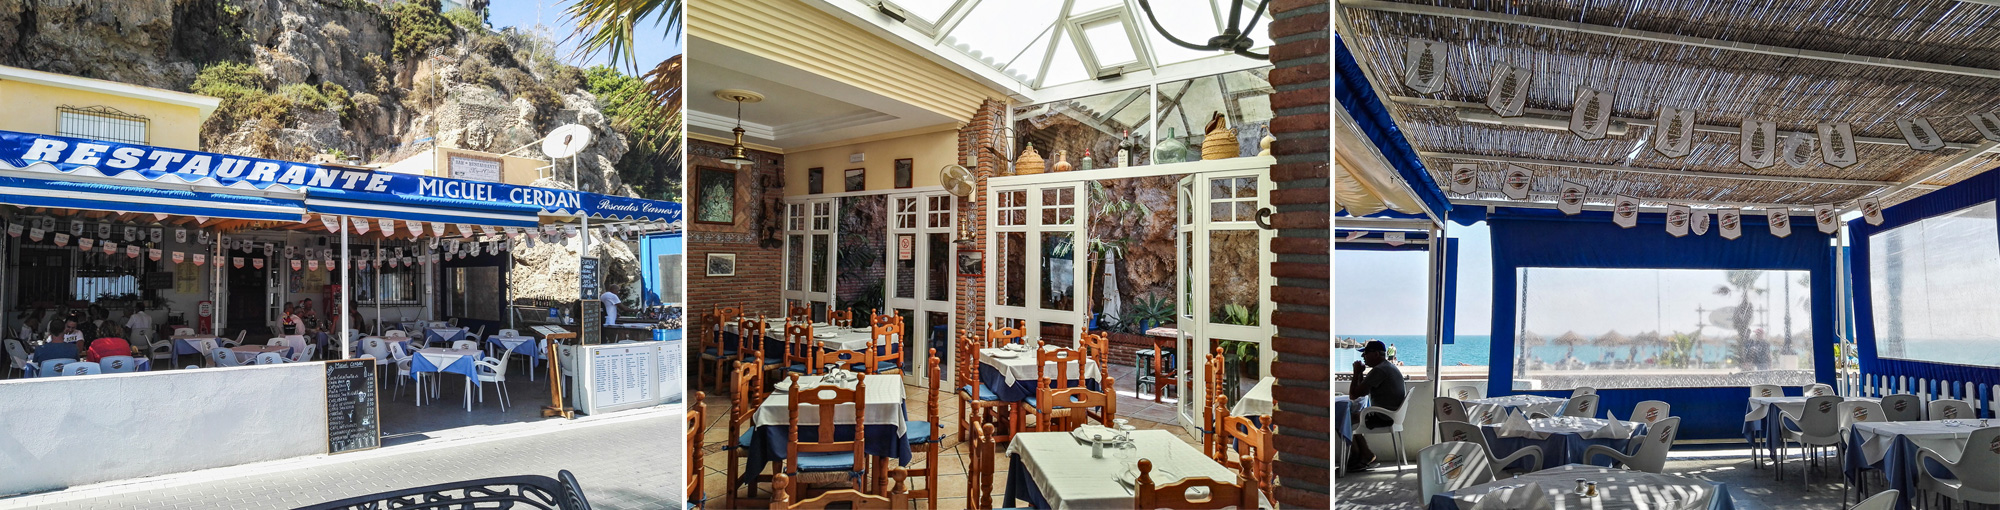 miguelcerdan_restaurante